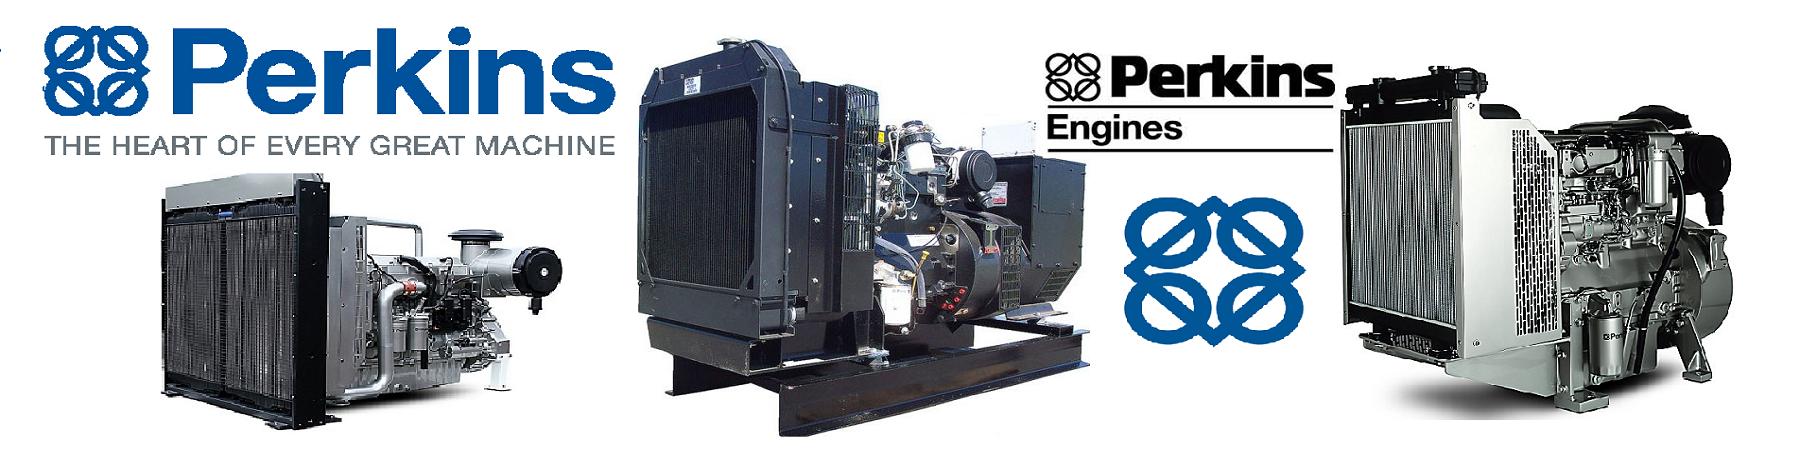 Perkins Engines Pakistan